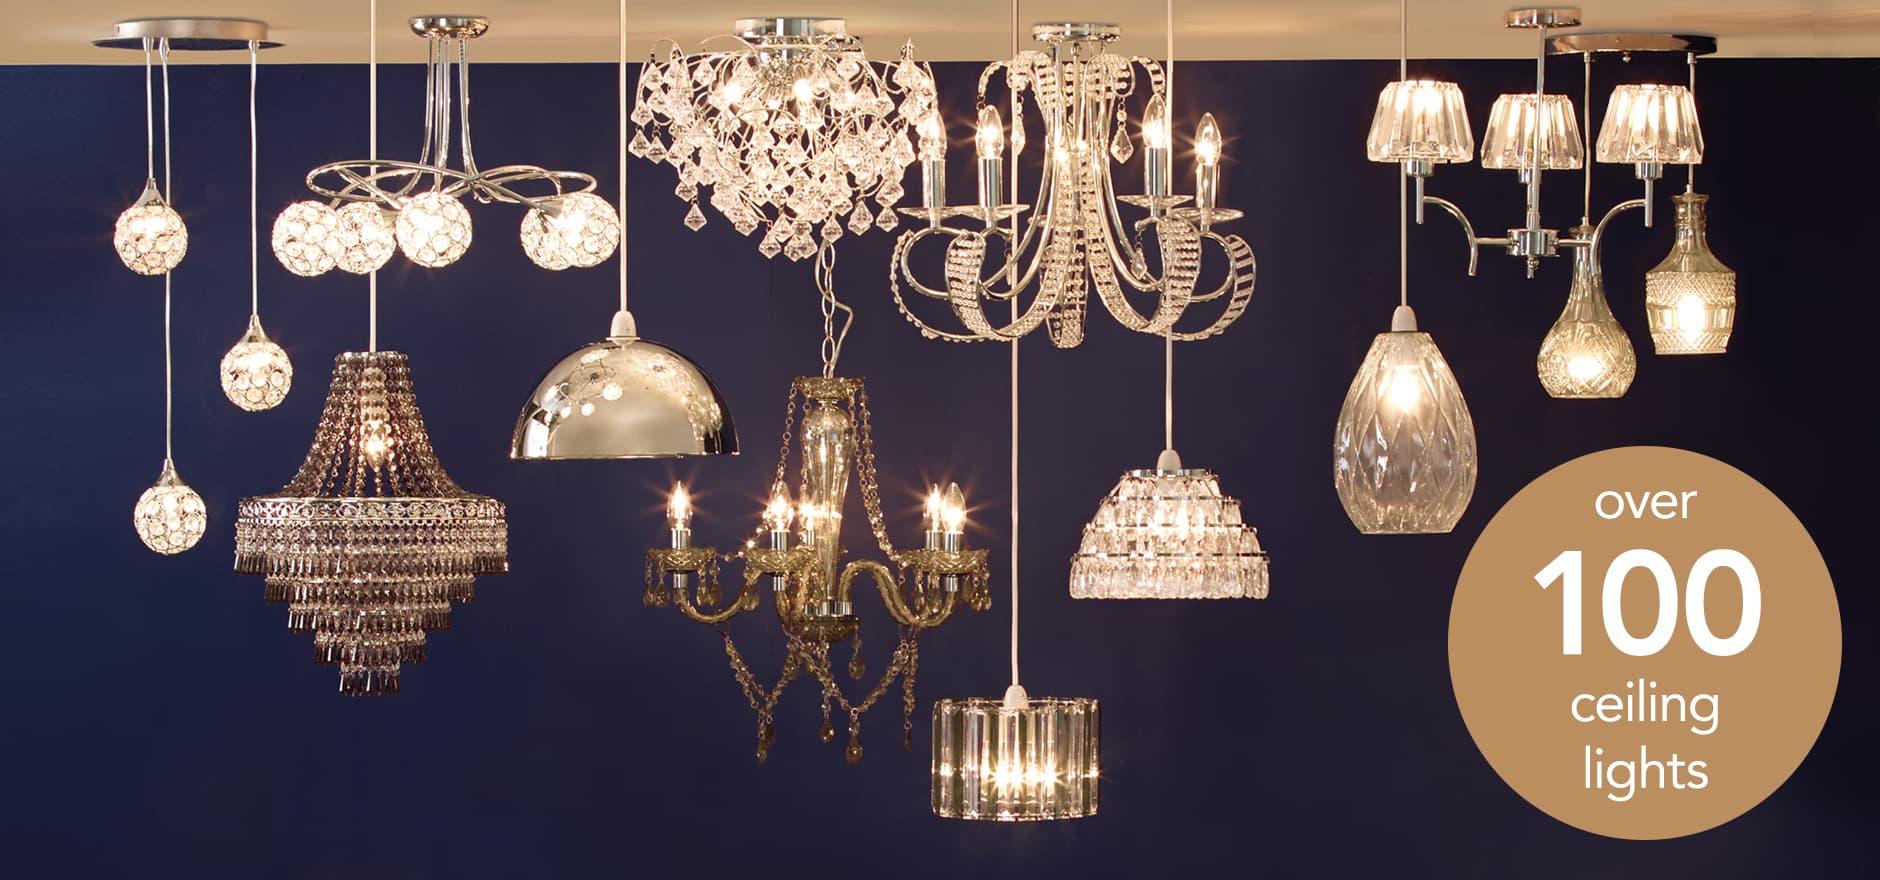 Dunelm Crystal Ceiling Lights : Lights home lighting dunelm